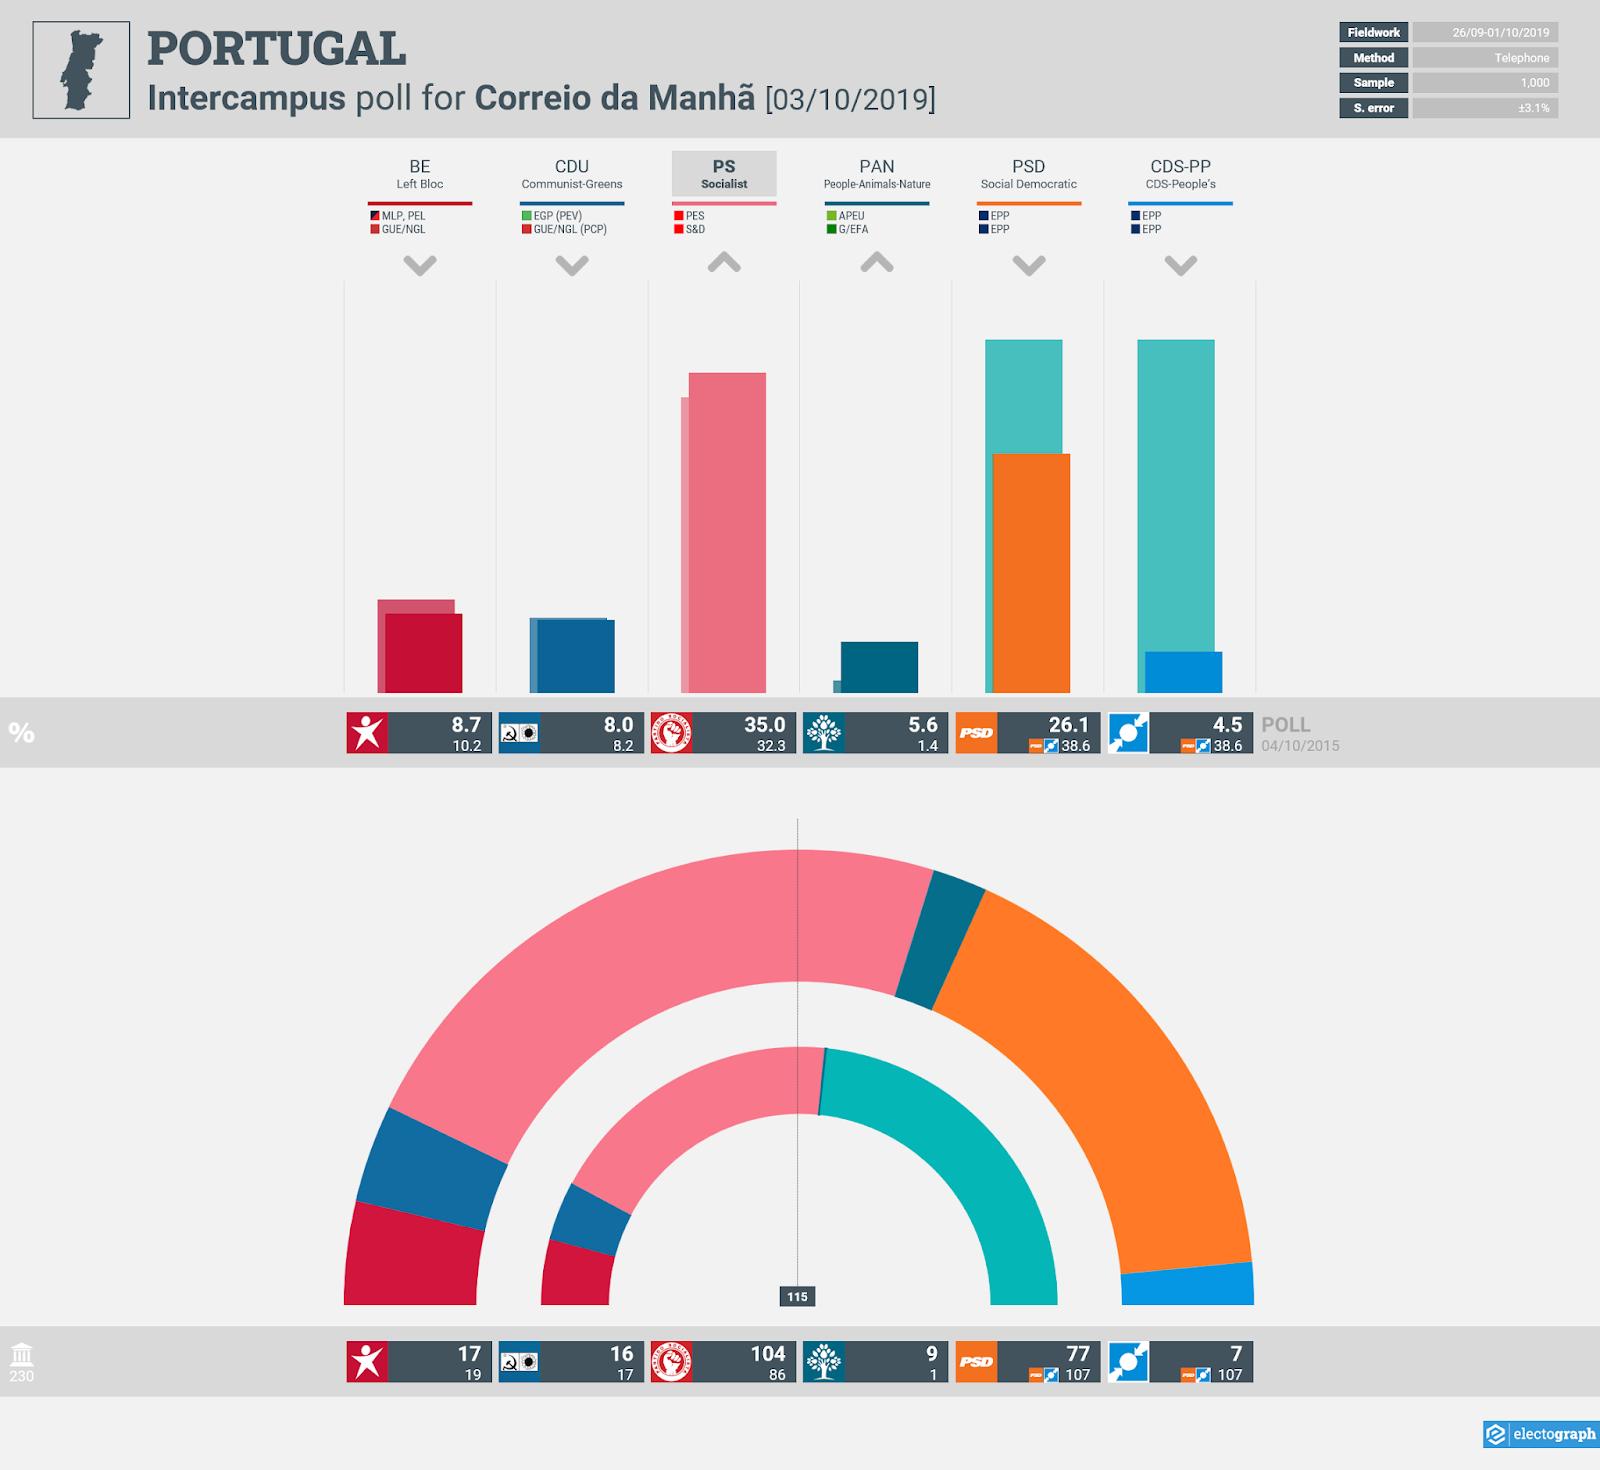 PORTUGAL: Intercampus poll chart for Correio da Manhã, 3 October 2019